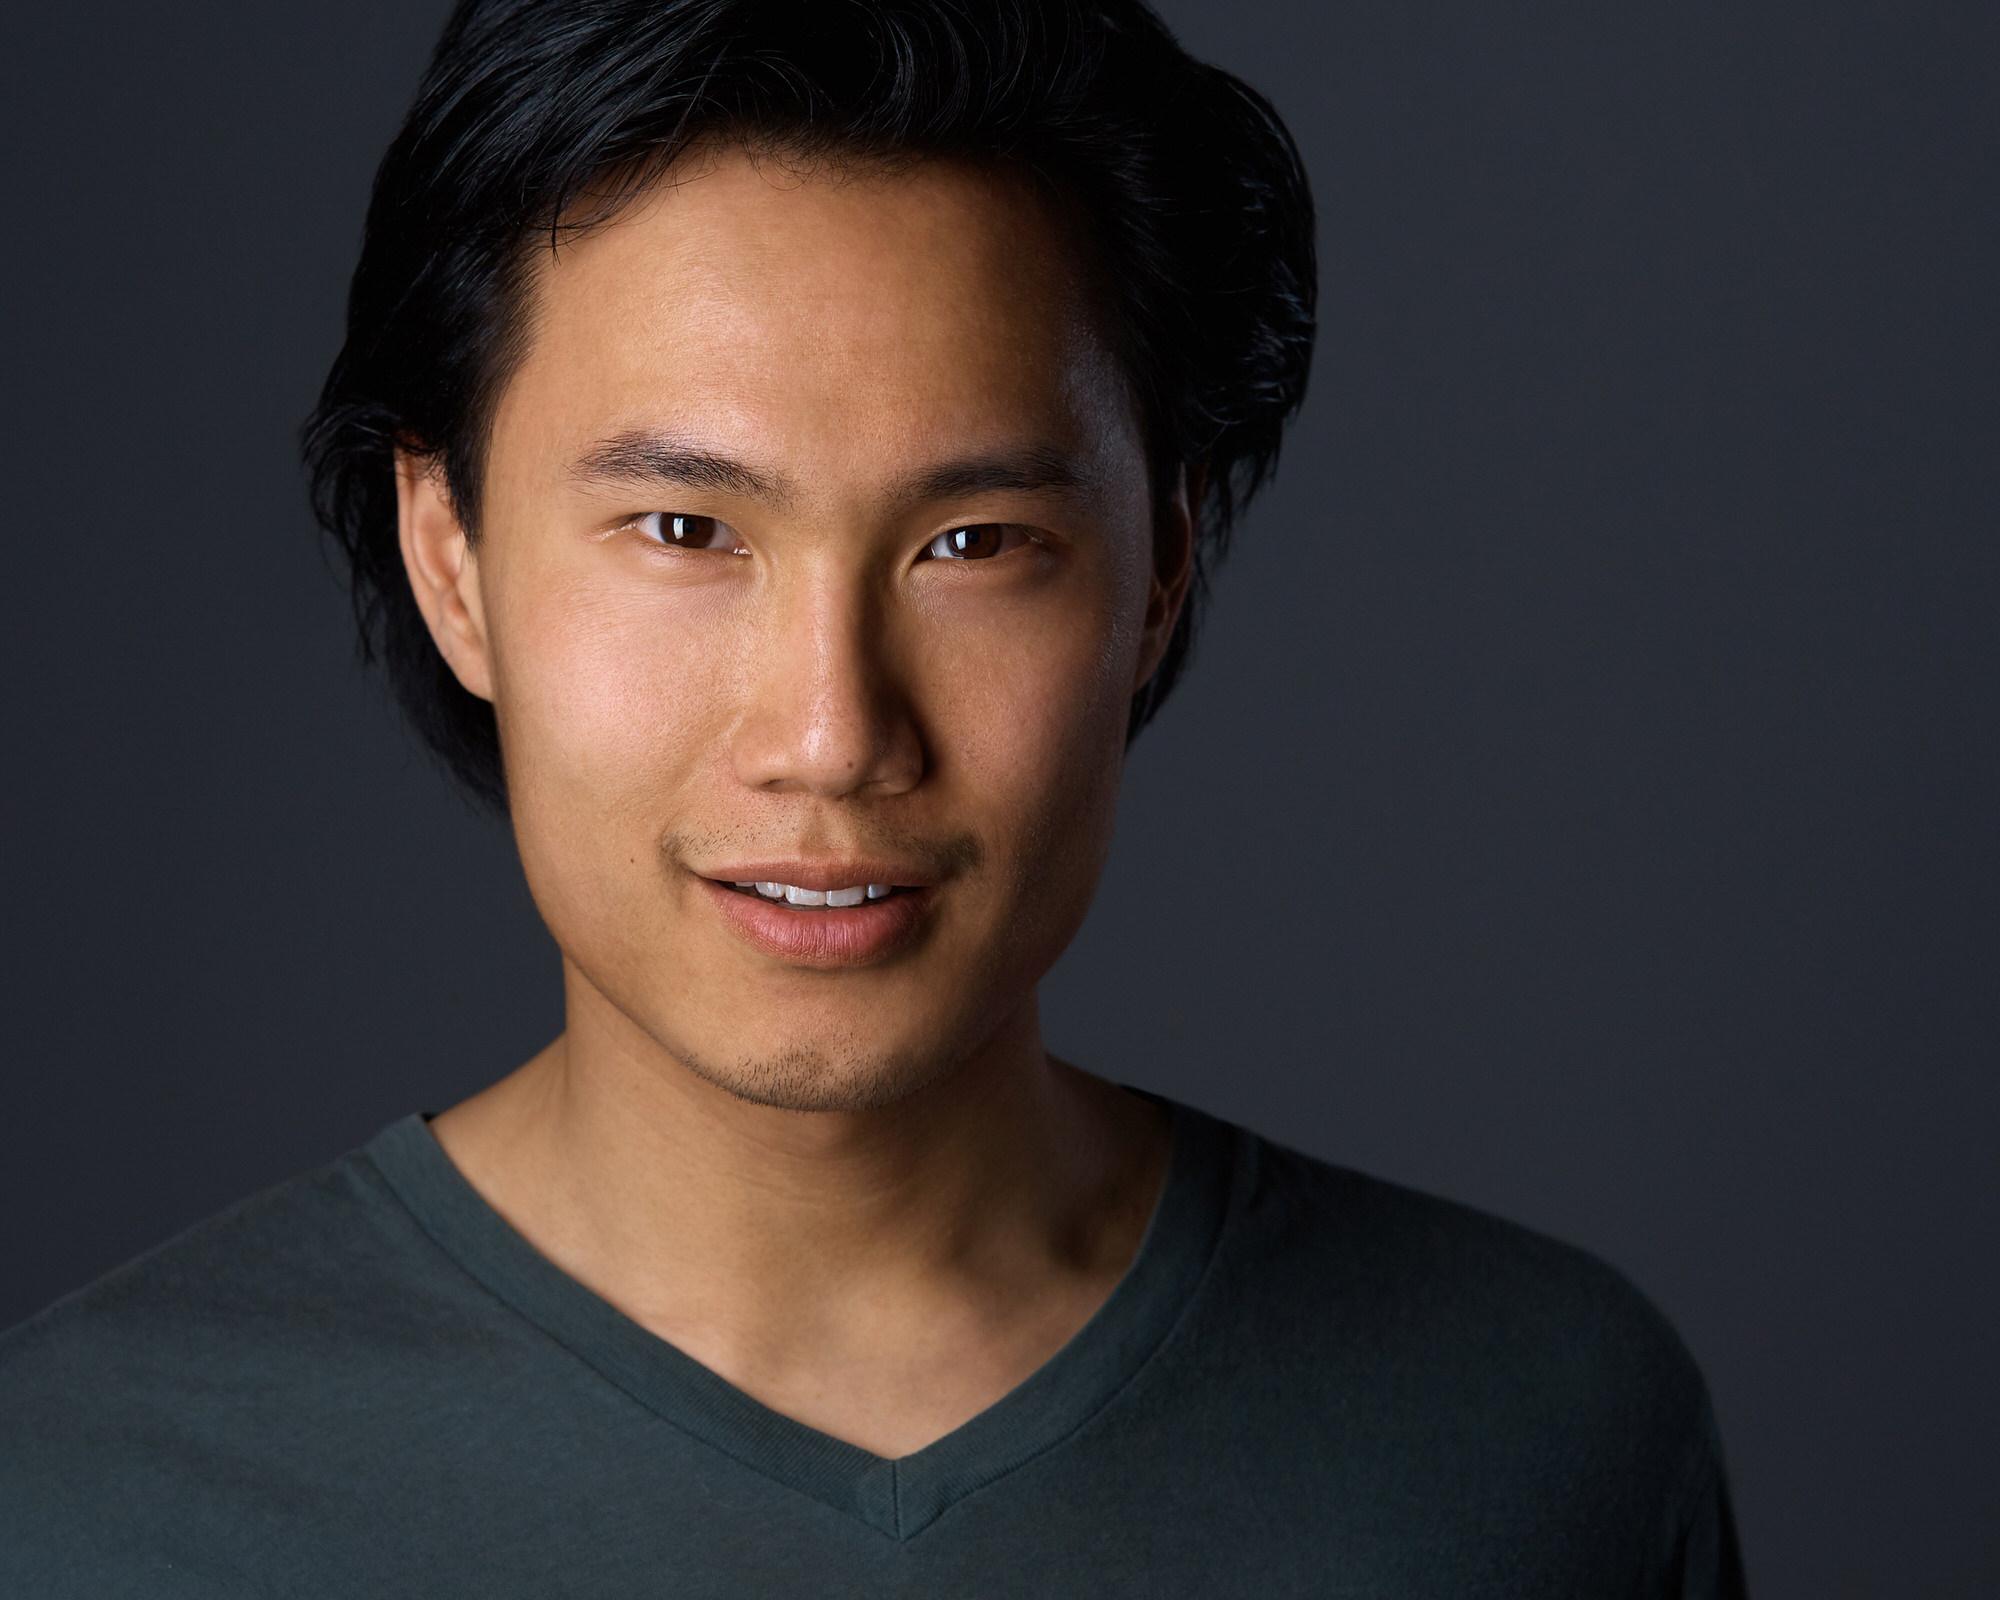 Bill Yong-Ryan-Parker-Photography-Edmonton-Headshots-Alberta-Headshot-Portrait-Photographer-Corporate-Actor-Business-Professional-Acting-Studio-Calgary.jpg